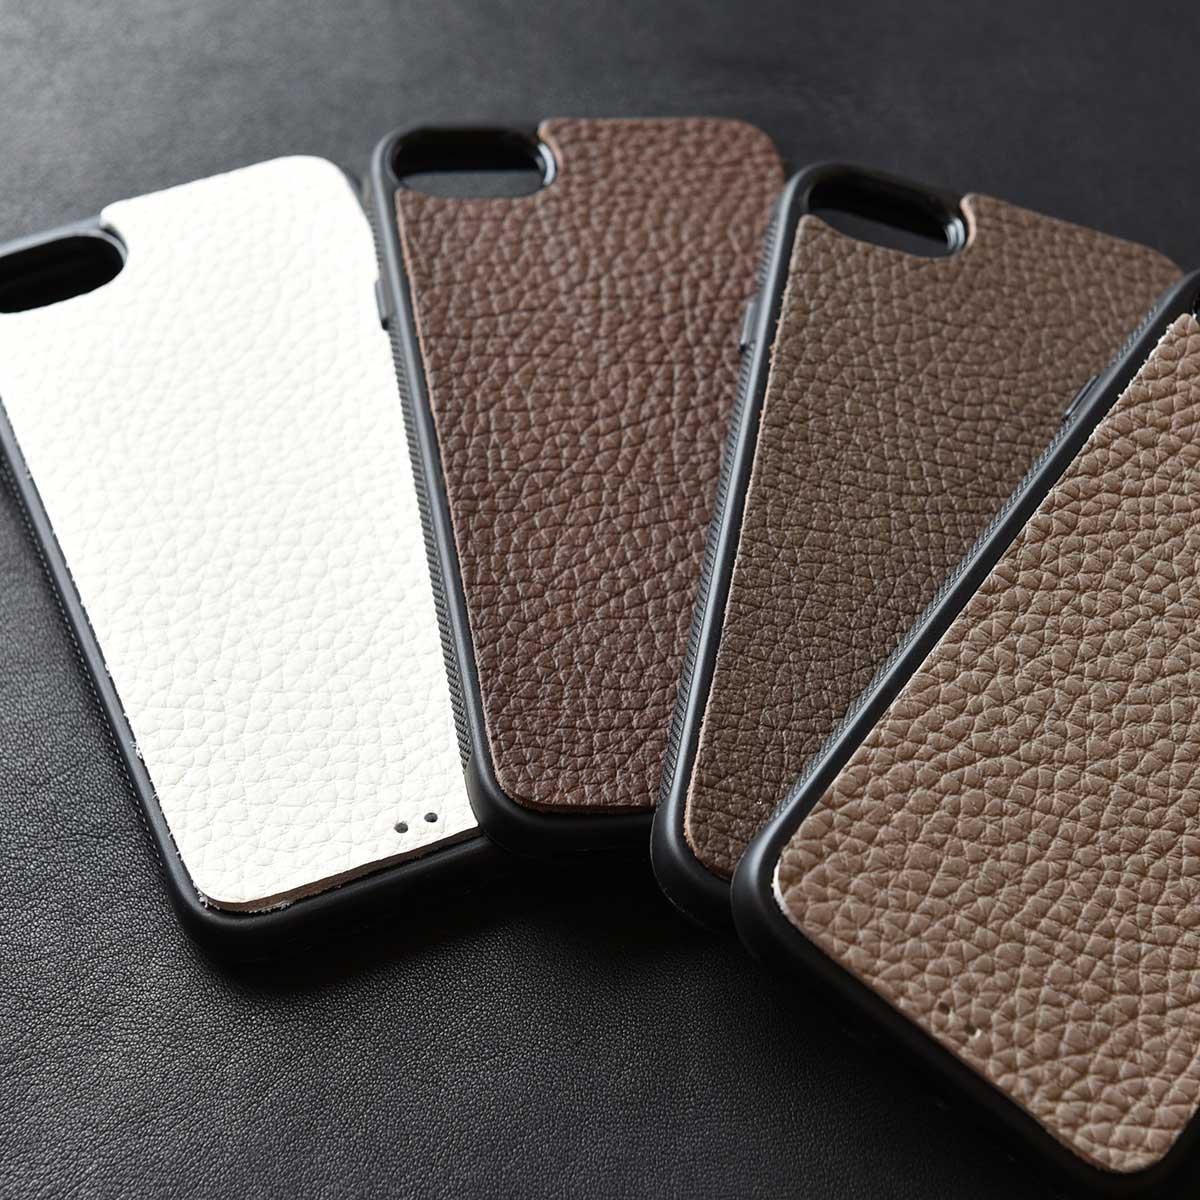 iPhoneOpenCase:   Limited Design:3